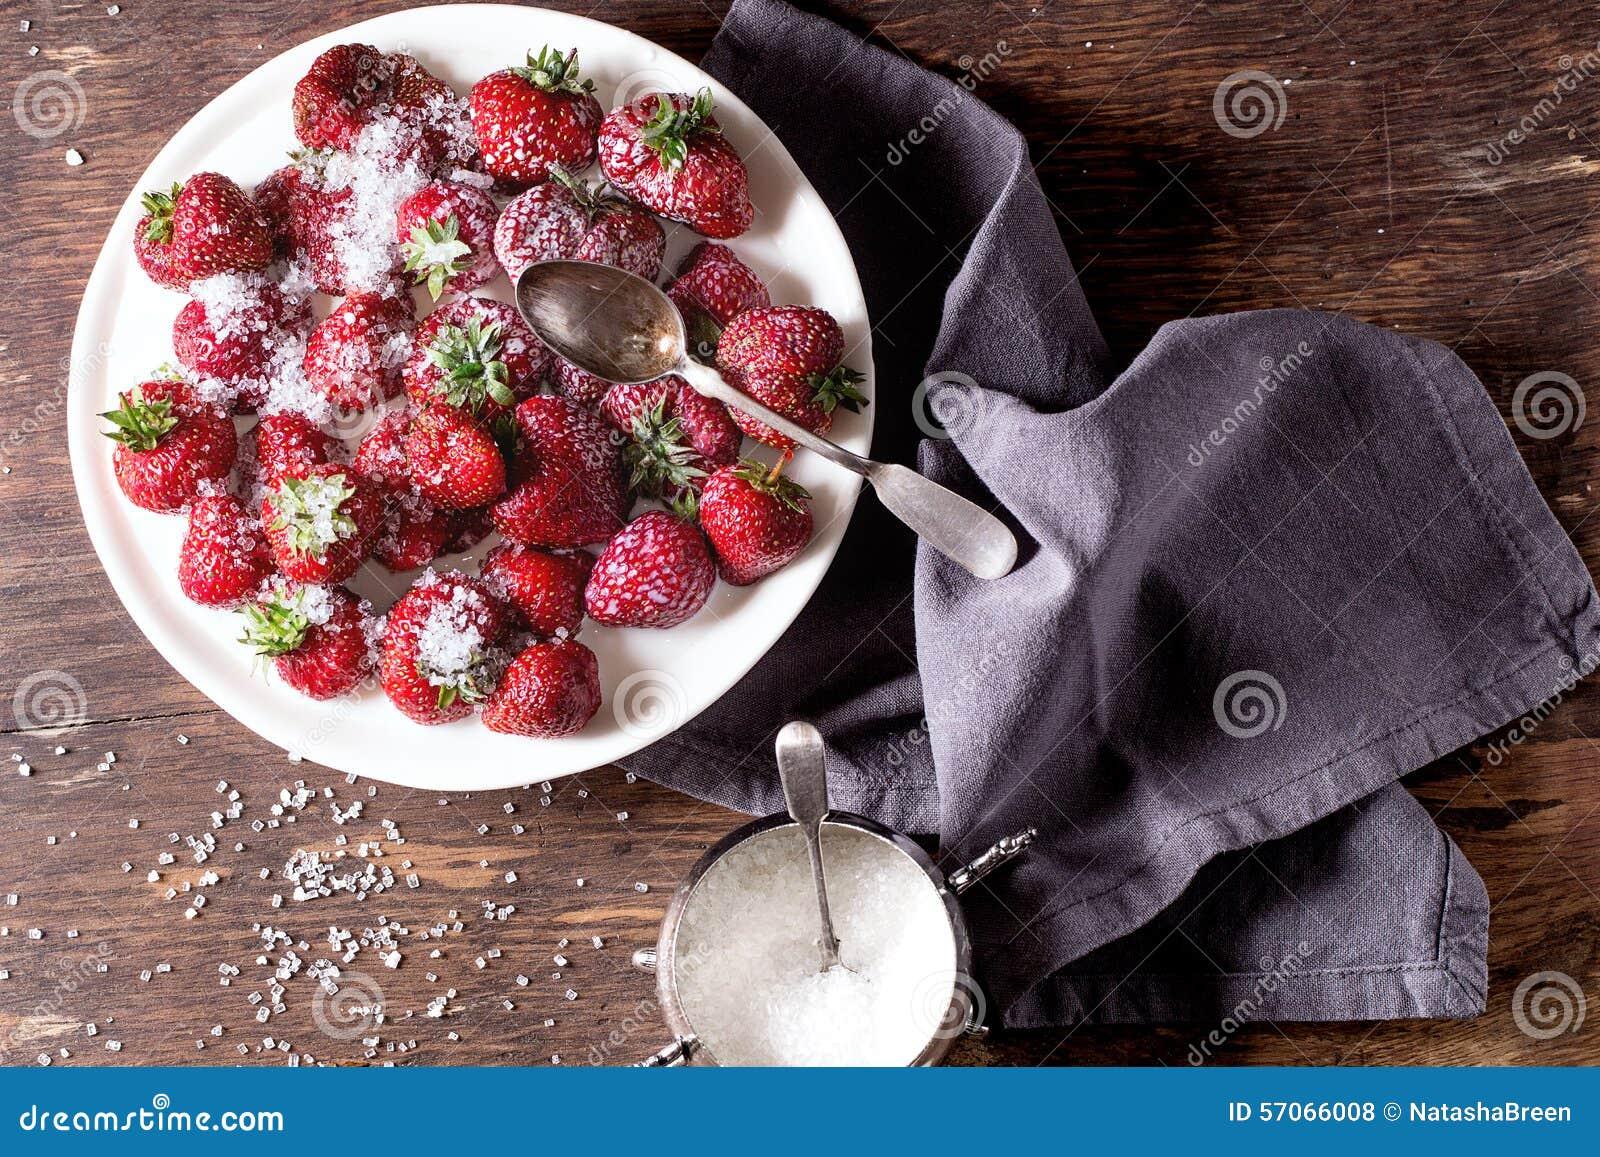 Tuinaardbeien met suiker en room